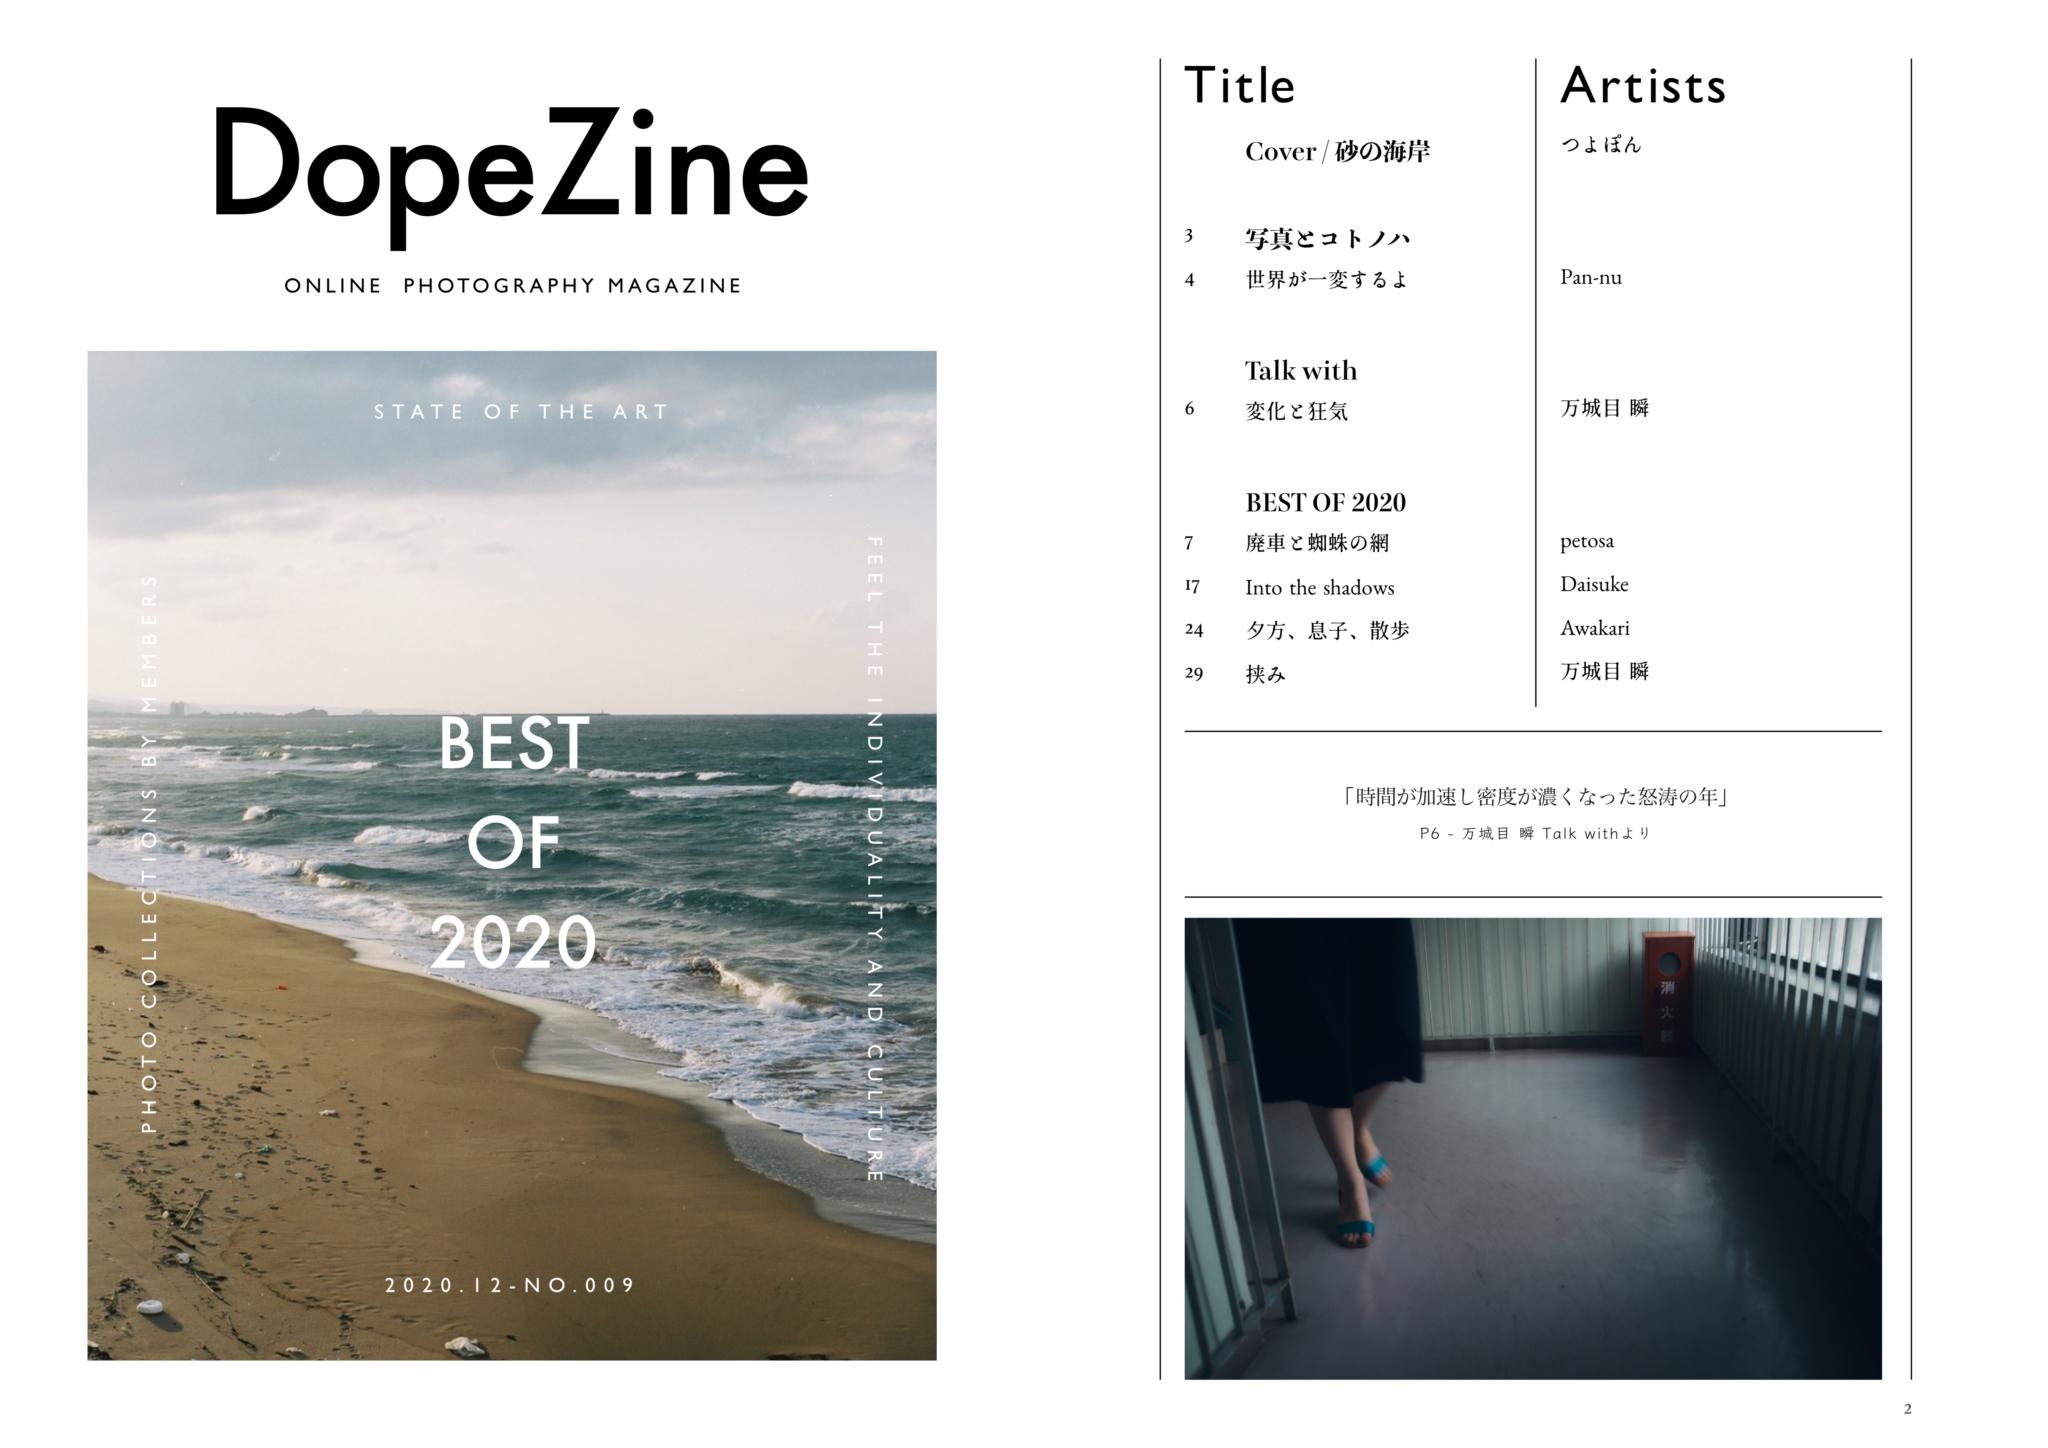 DopeZine – Online Web Magazine – 2020/12